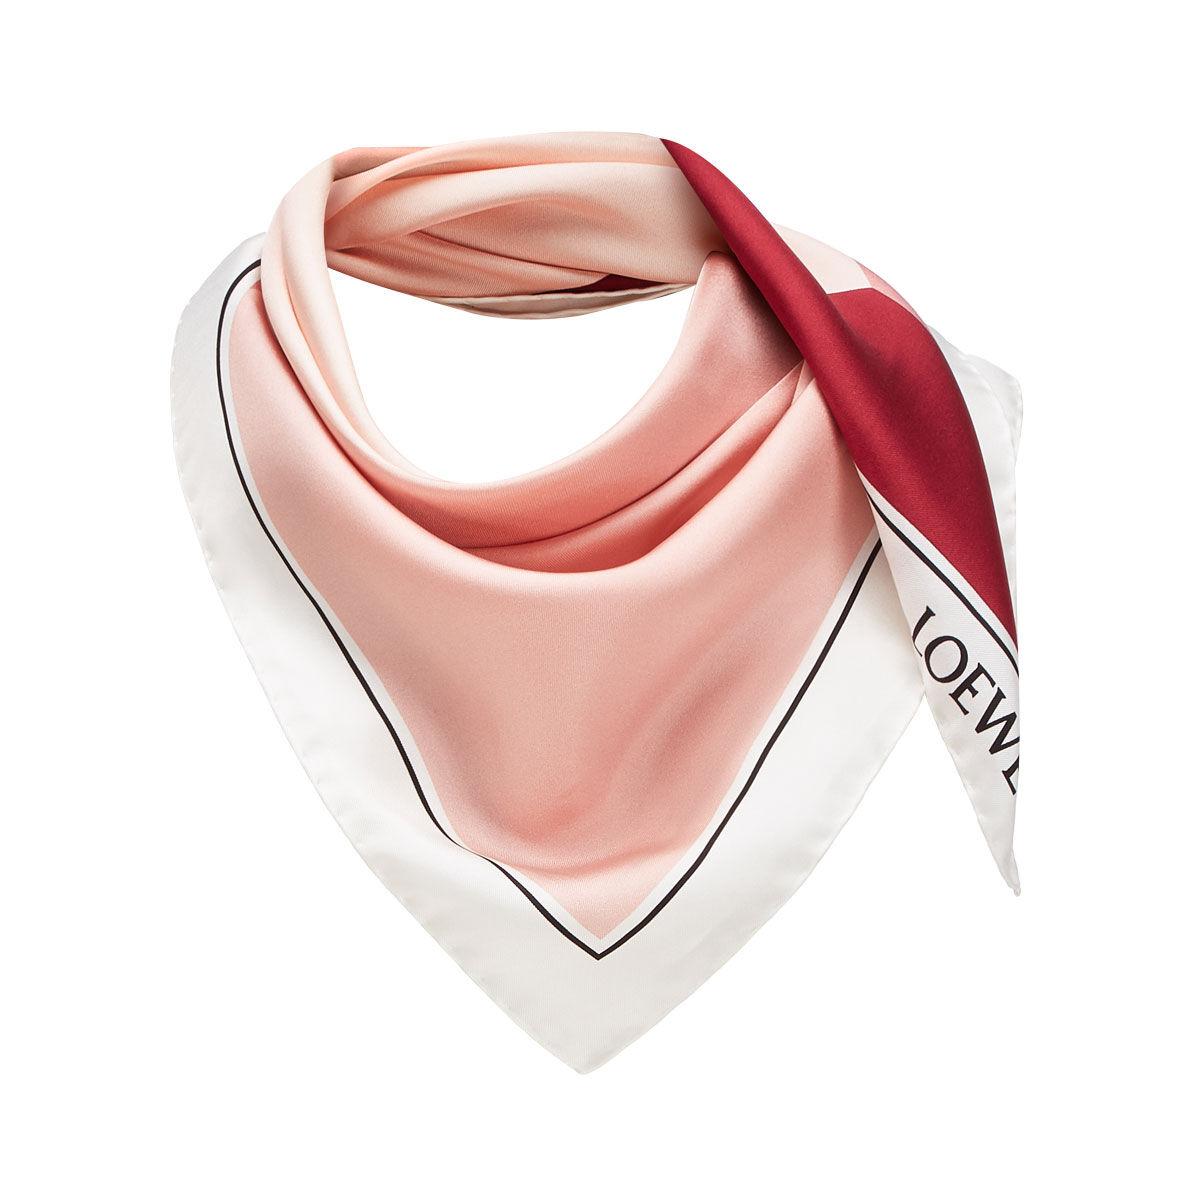 LOEWE 90X90 スカーフパズル ピンク all